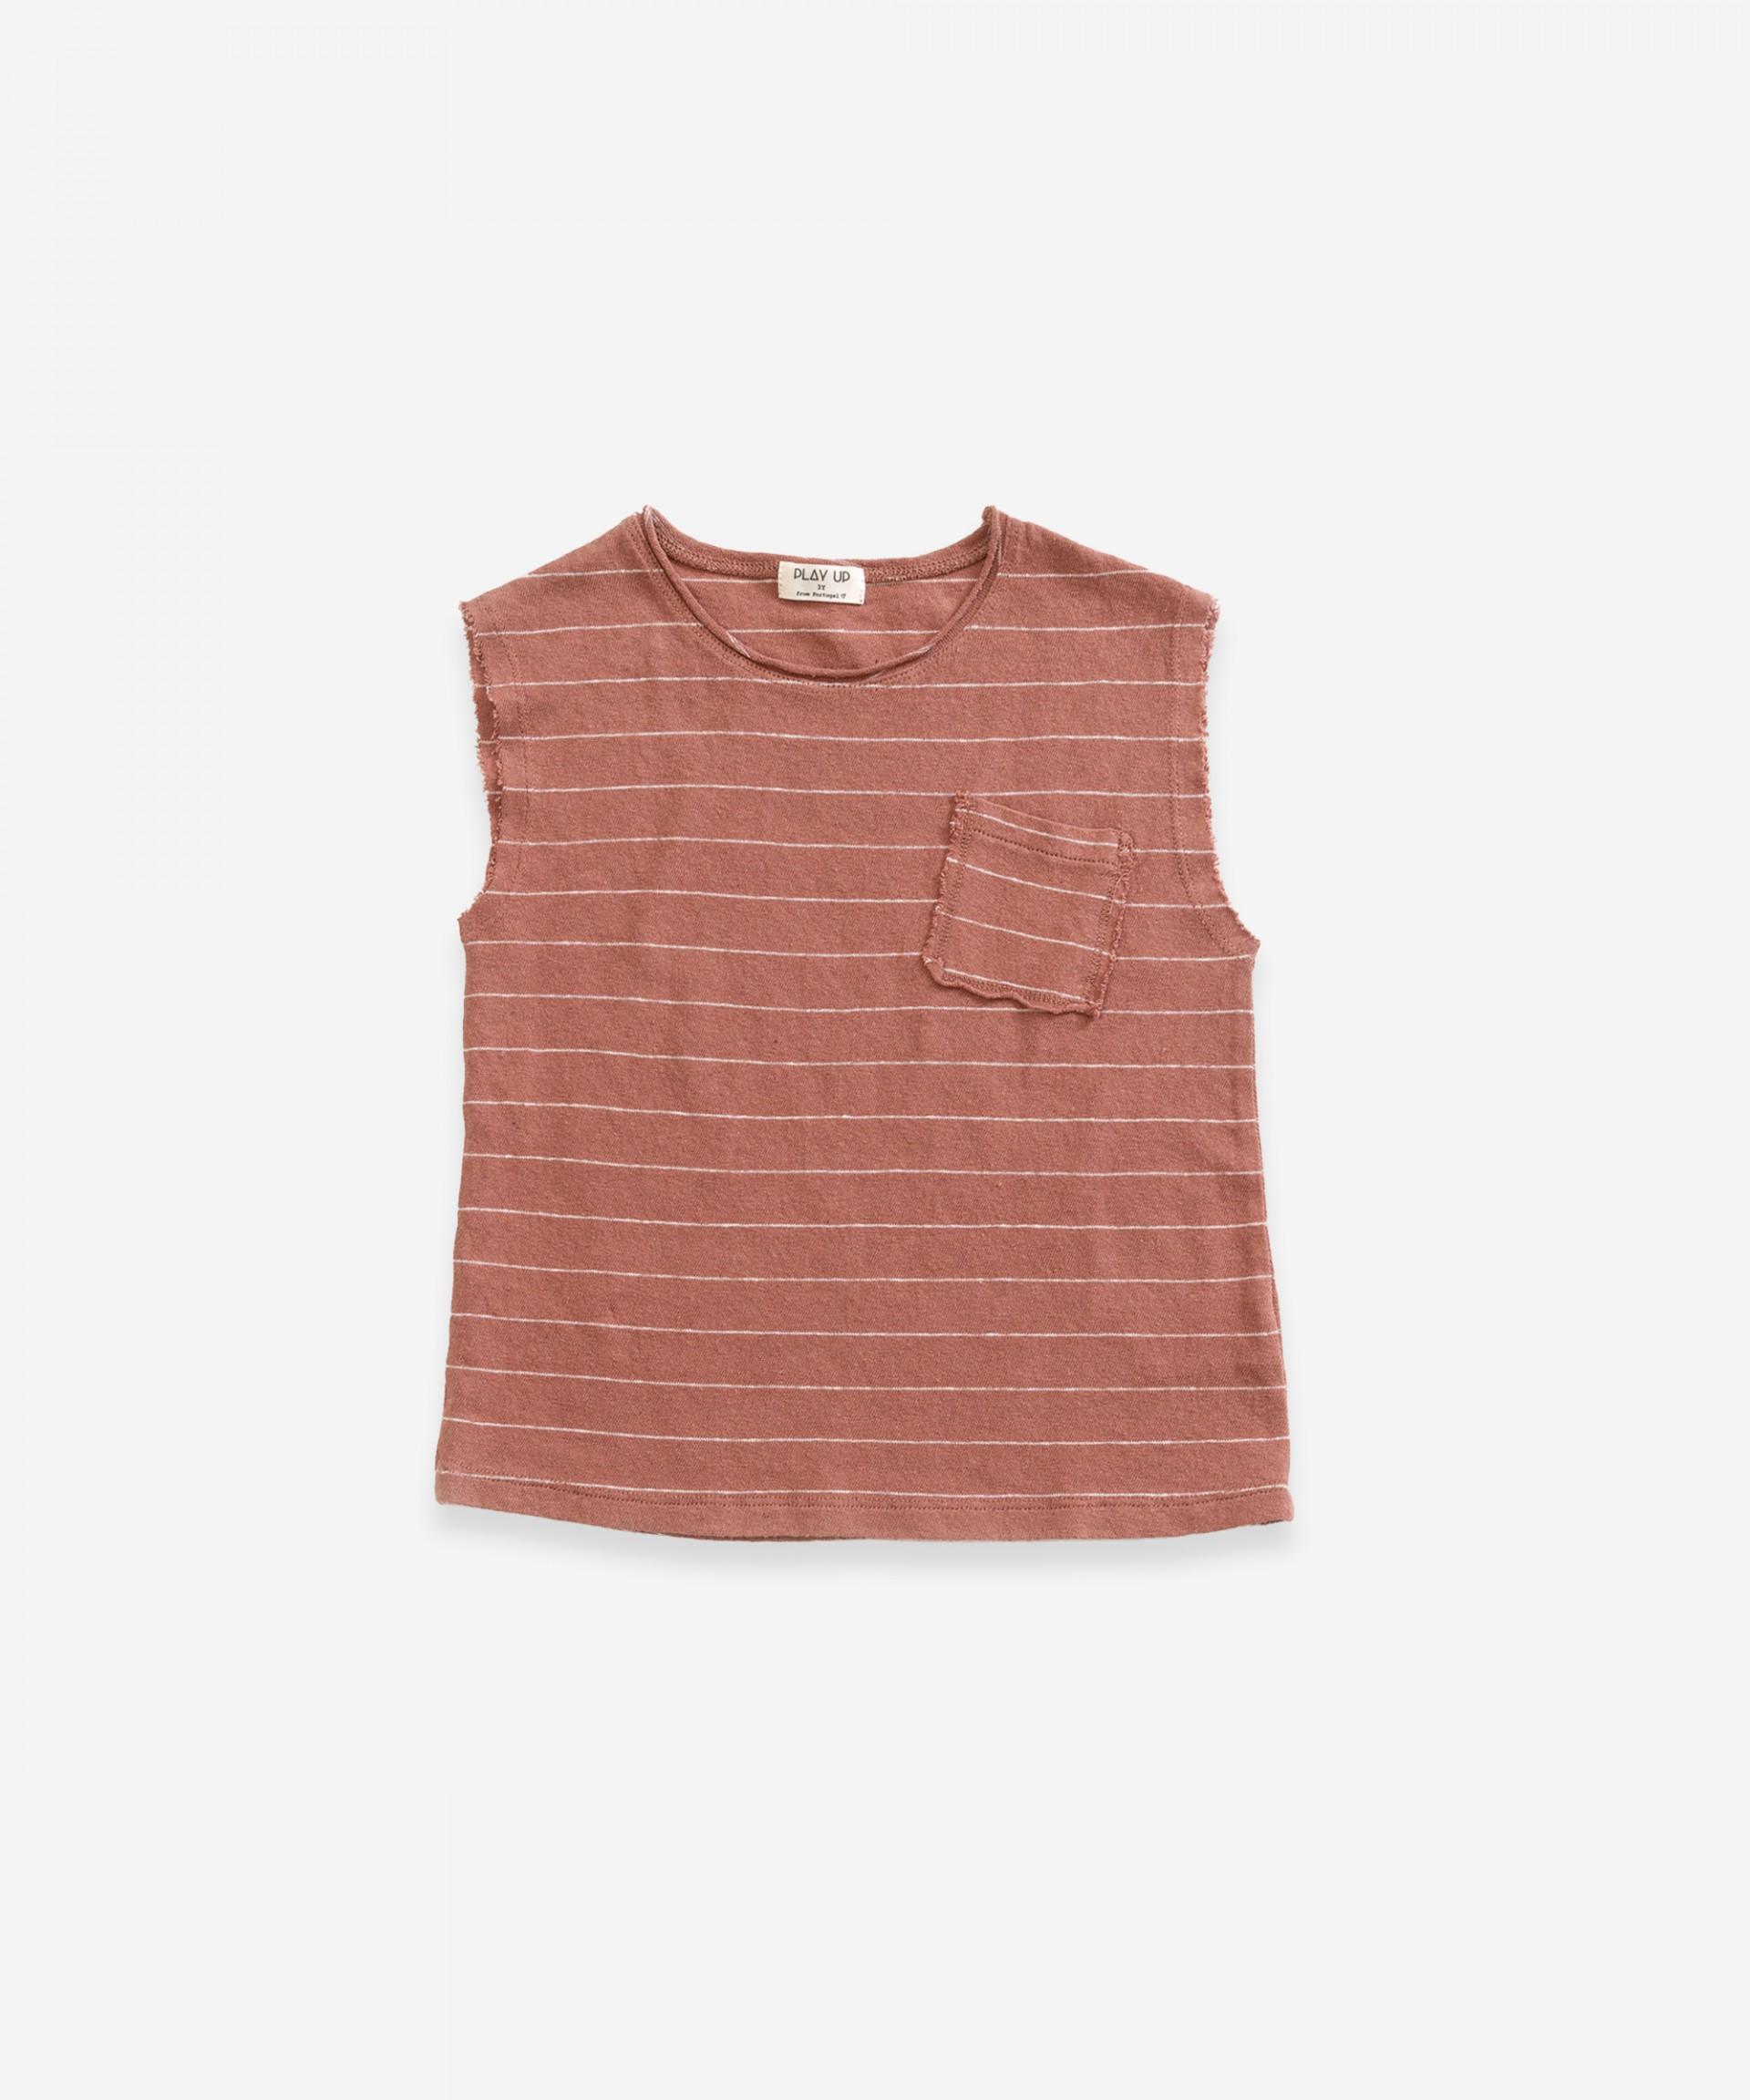 Camiseta sin mangas de algodón-lino| Weaving